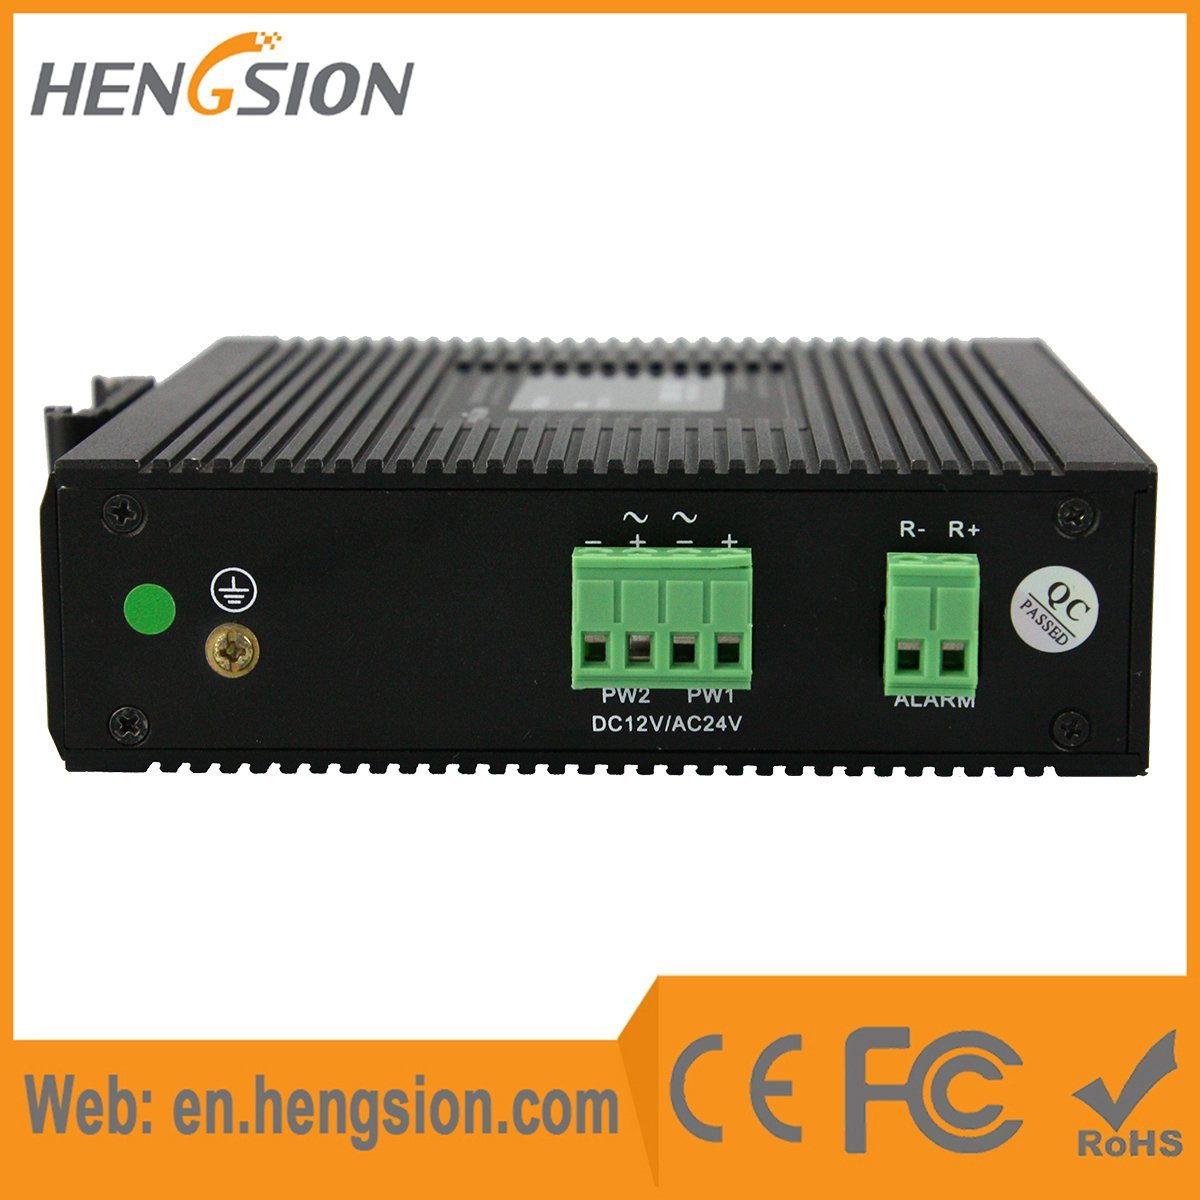 5 Megabit Port RJ45 Industrial Ethernet Network Switch